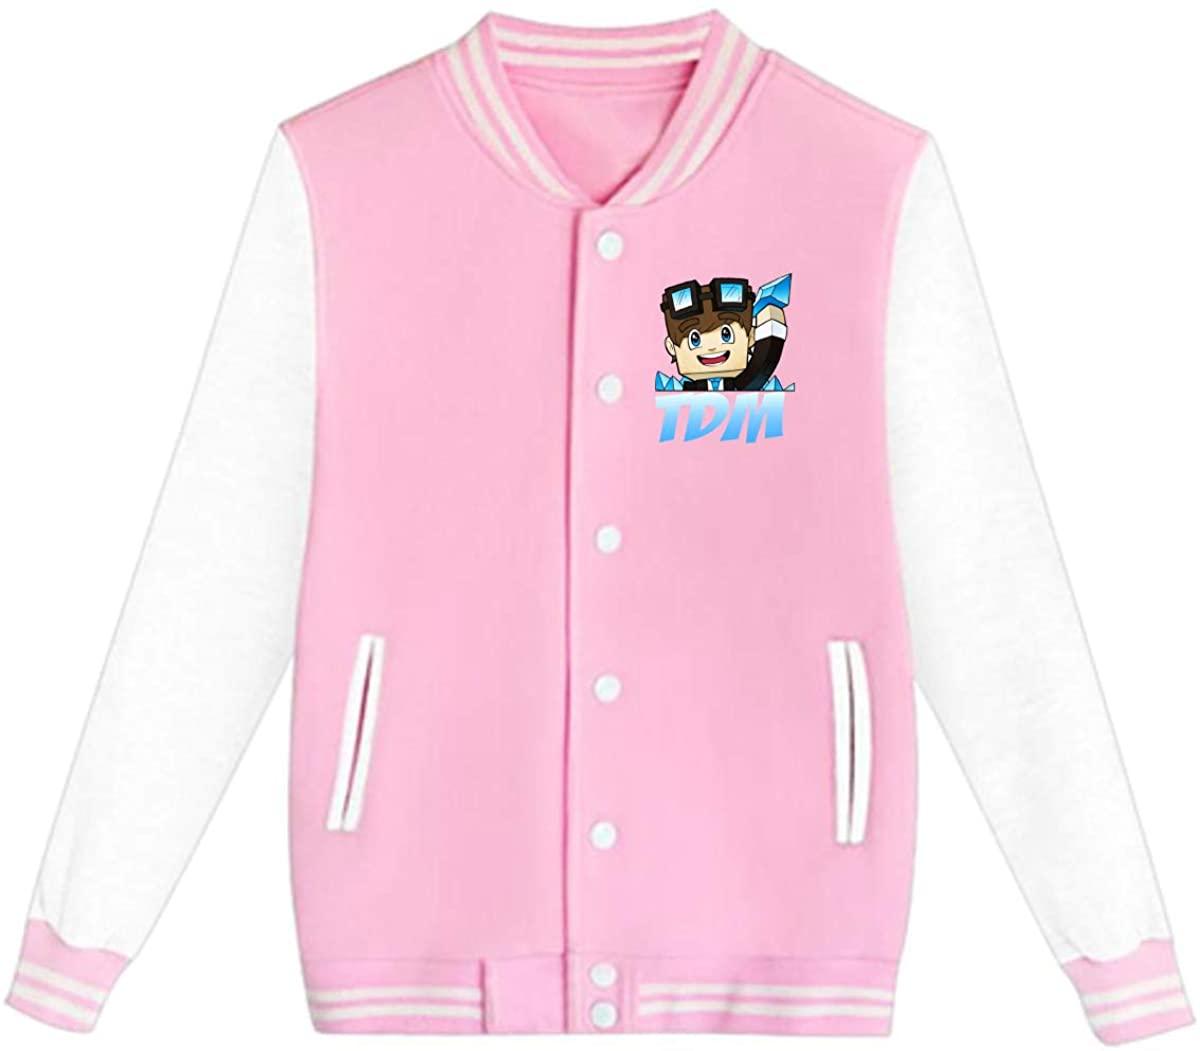 AHUAHUA DanTDM Dan TDM Logo Unisex Youth Boys and Girls Sweatshirt Baseball Uniform Jacket Sport Coat